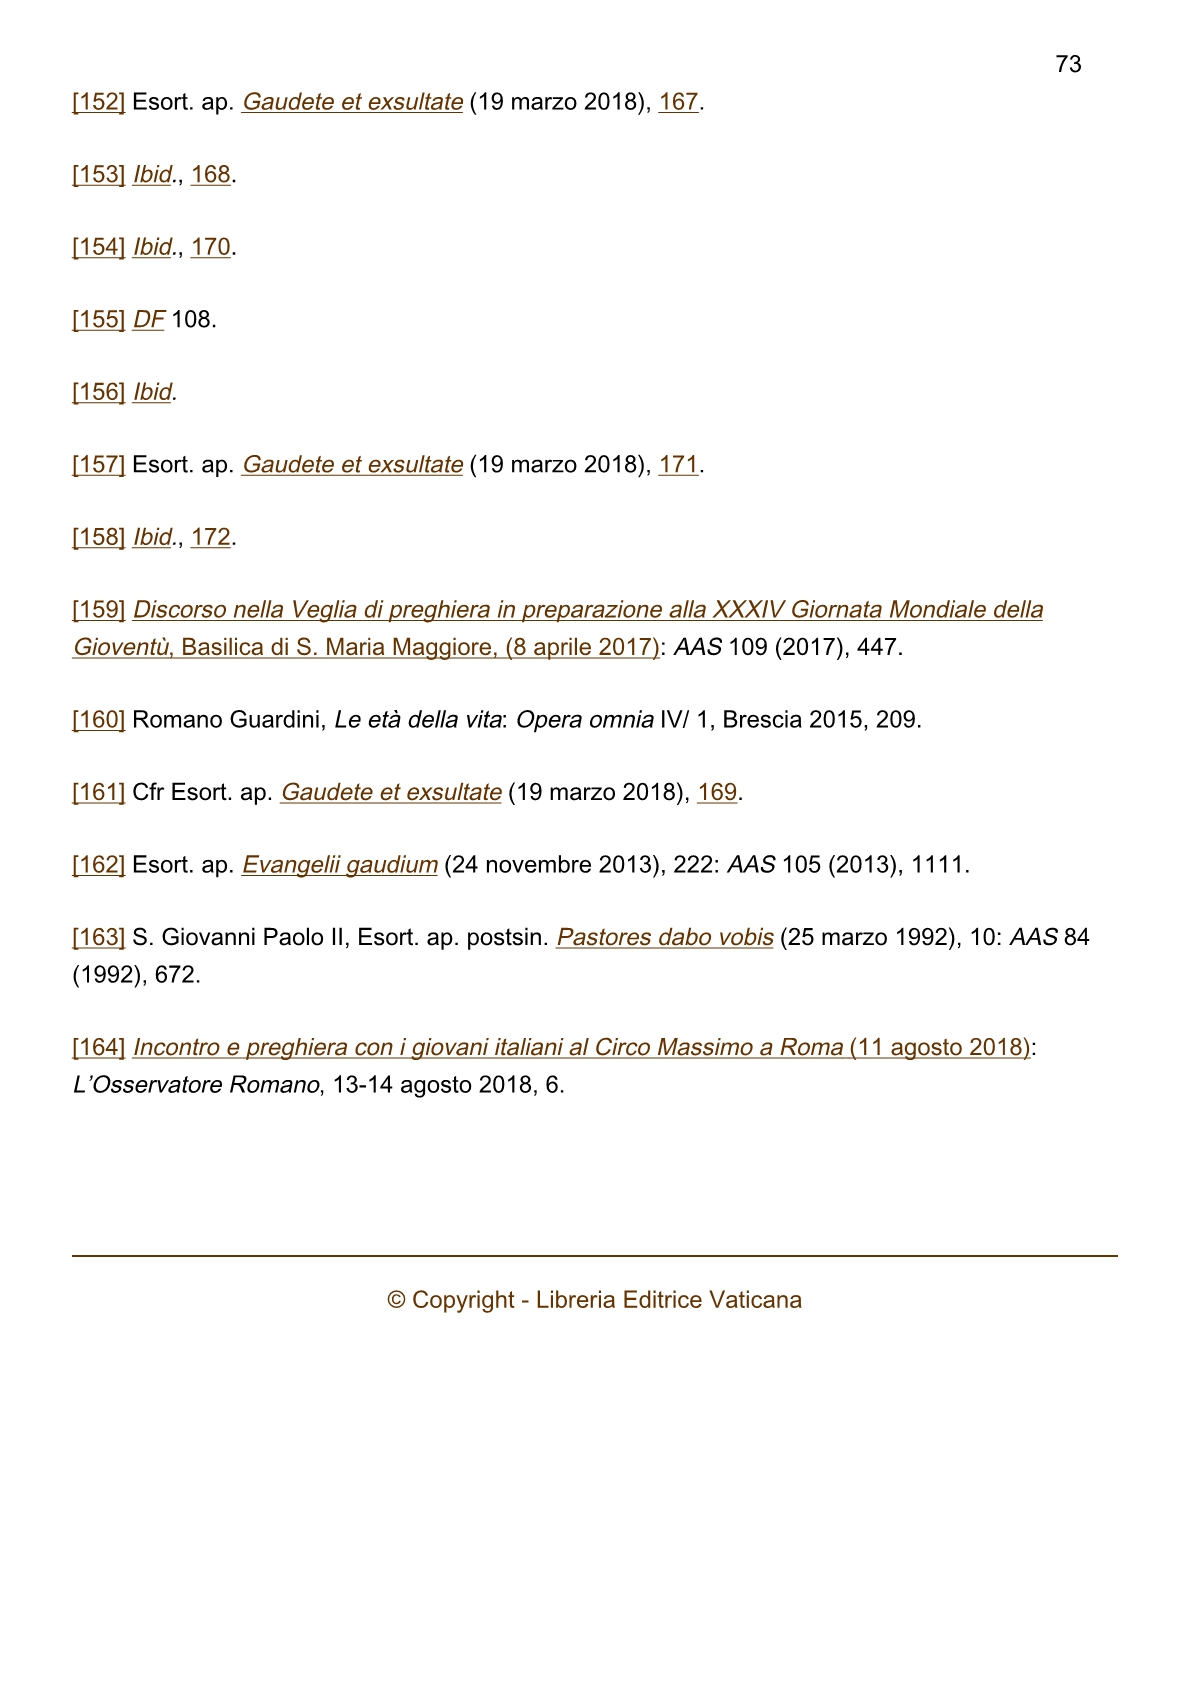 papa-francesco_esortazione-ap_20190325_christus-vivit73